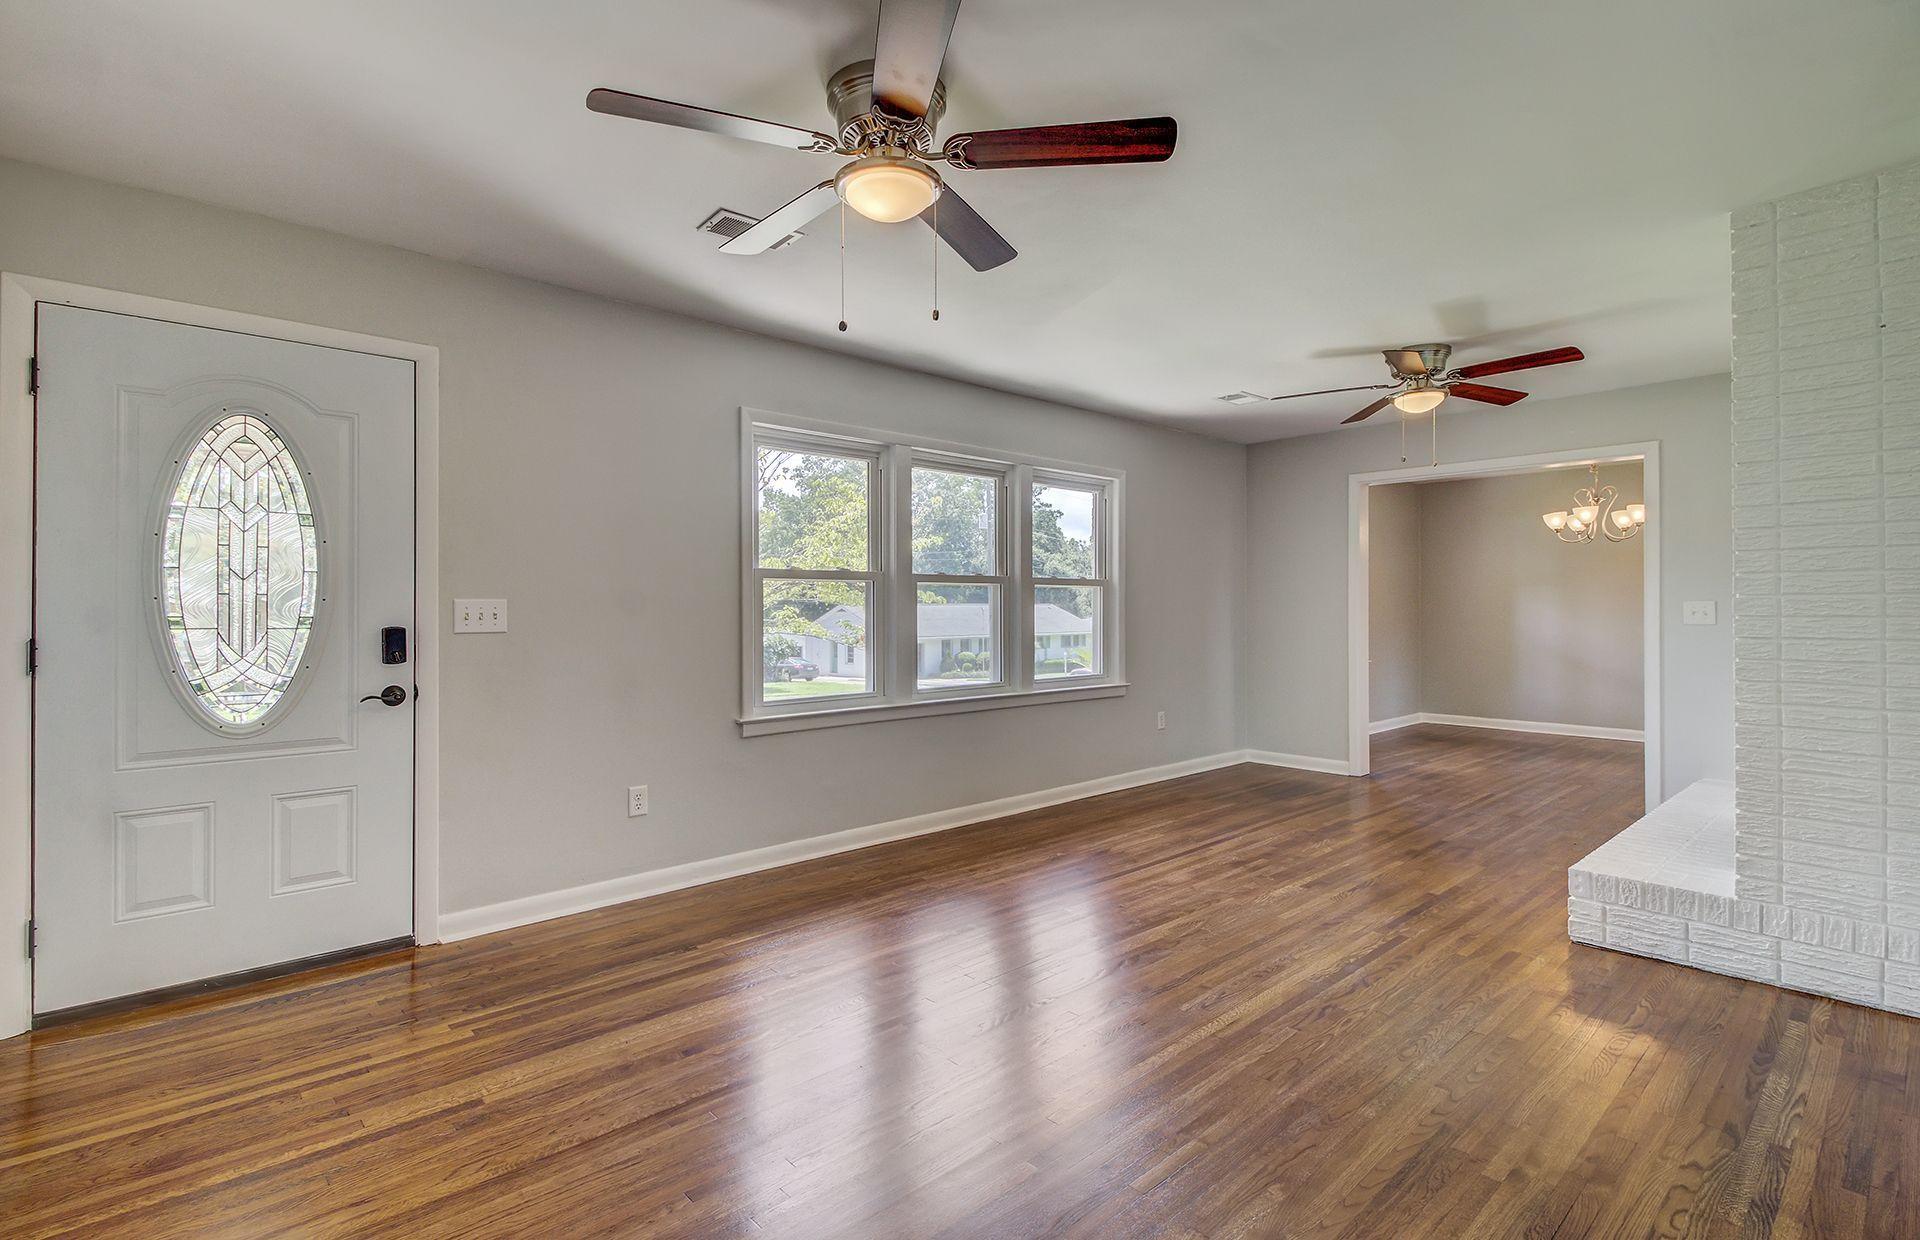 Belvedere Estates Homes For Sale - 6010 Ridgecrest, Hanahan, SC - 10